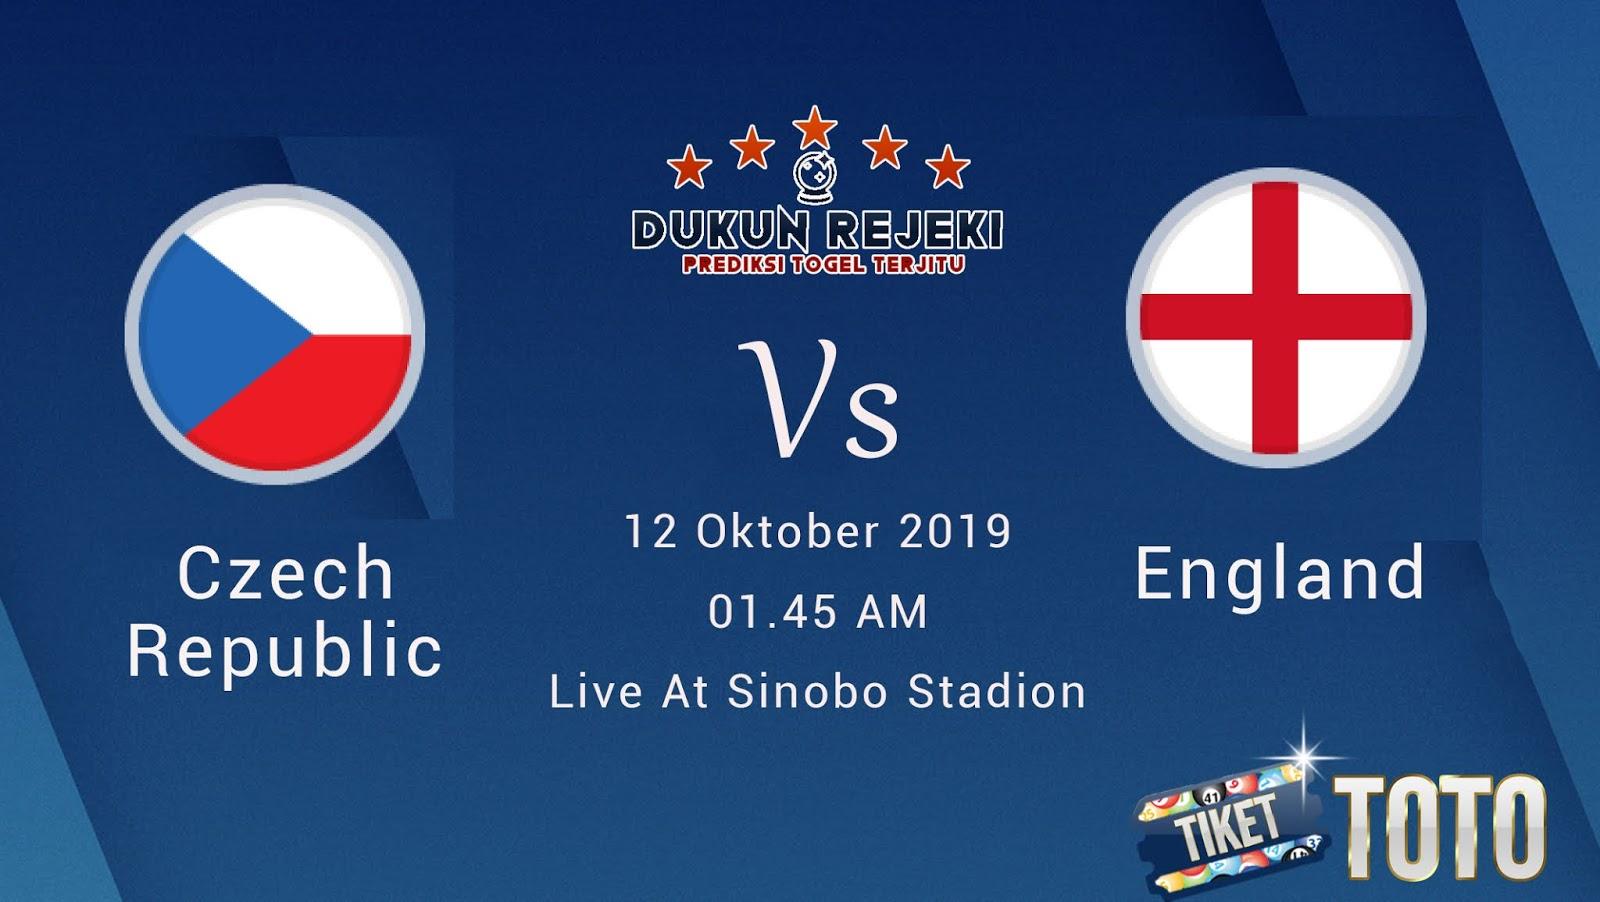 Prediksi Czech Republic Vs England 12 Oktober 2019